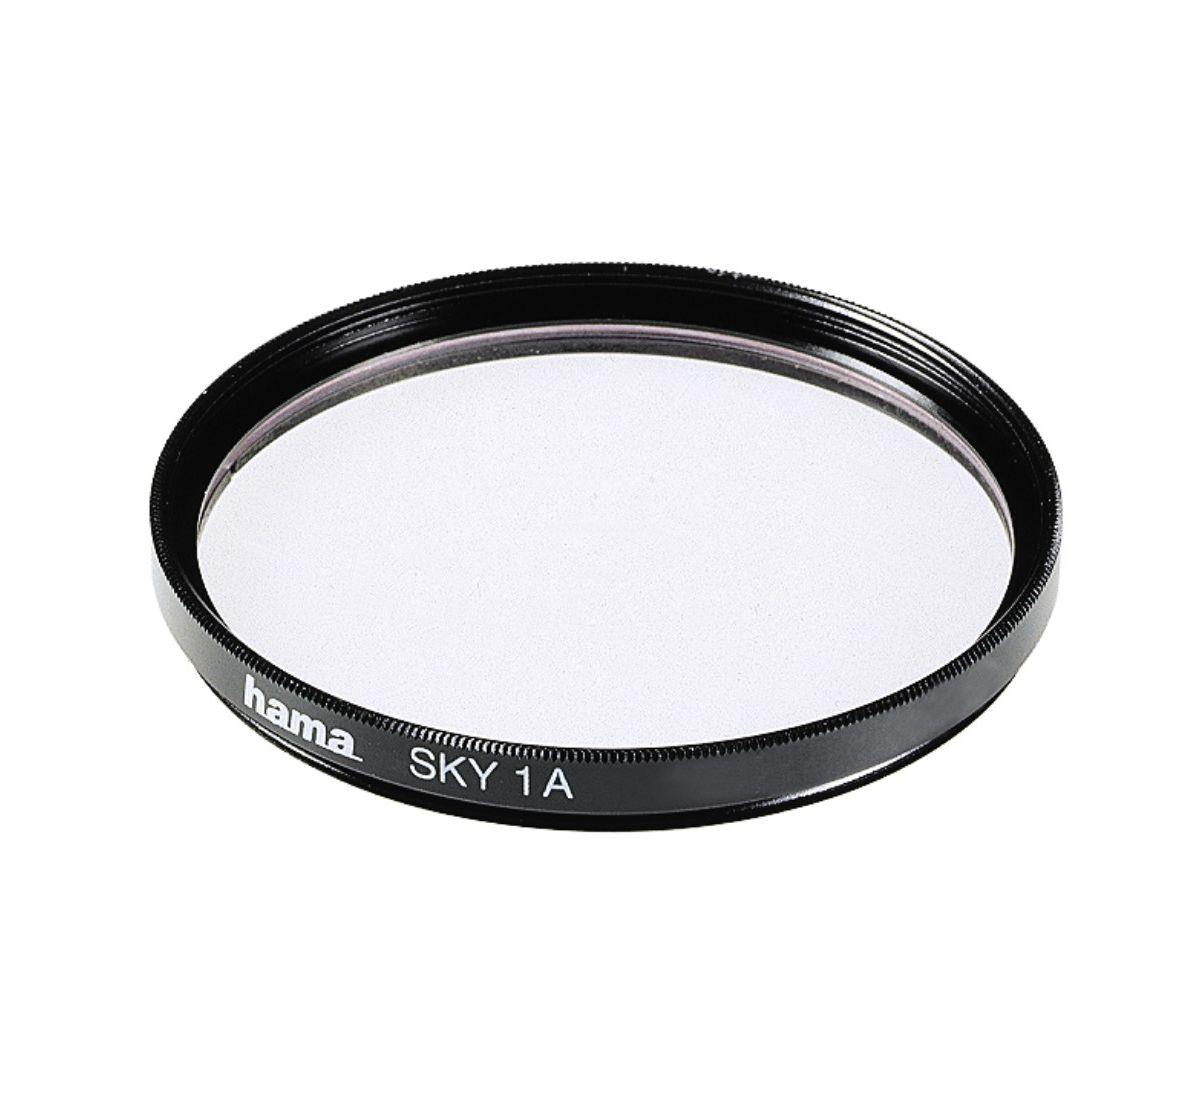 Hama Skylight-Filter 1 A (LA+10), AR coated, 67...